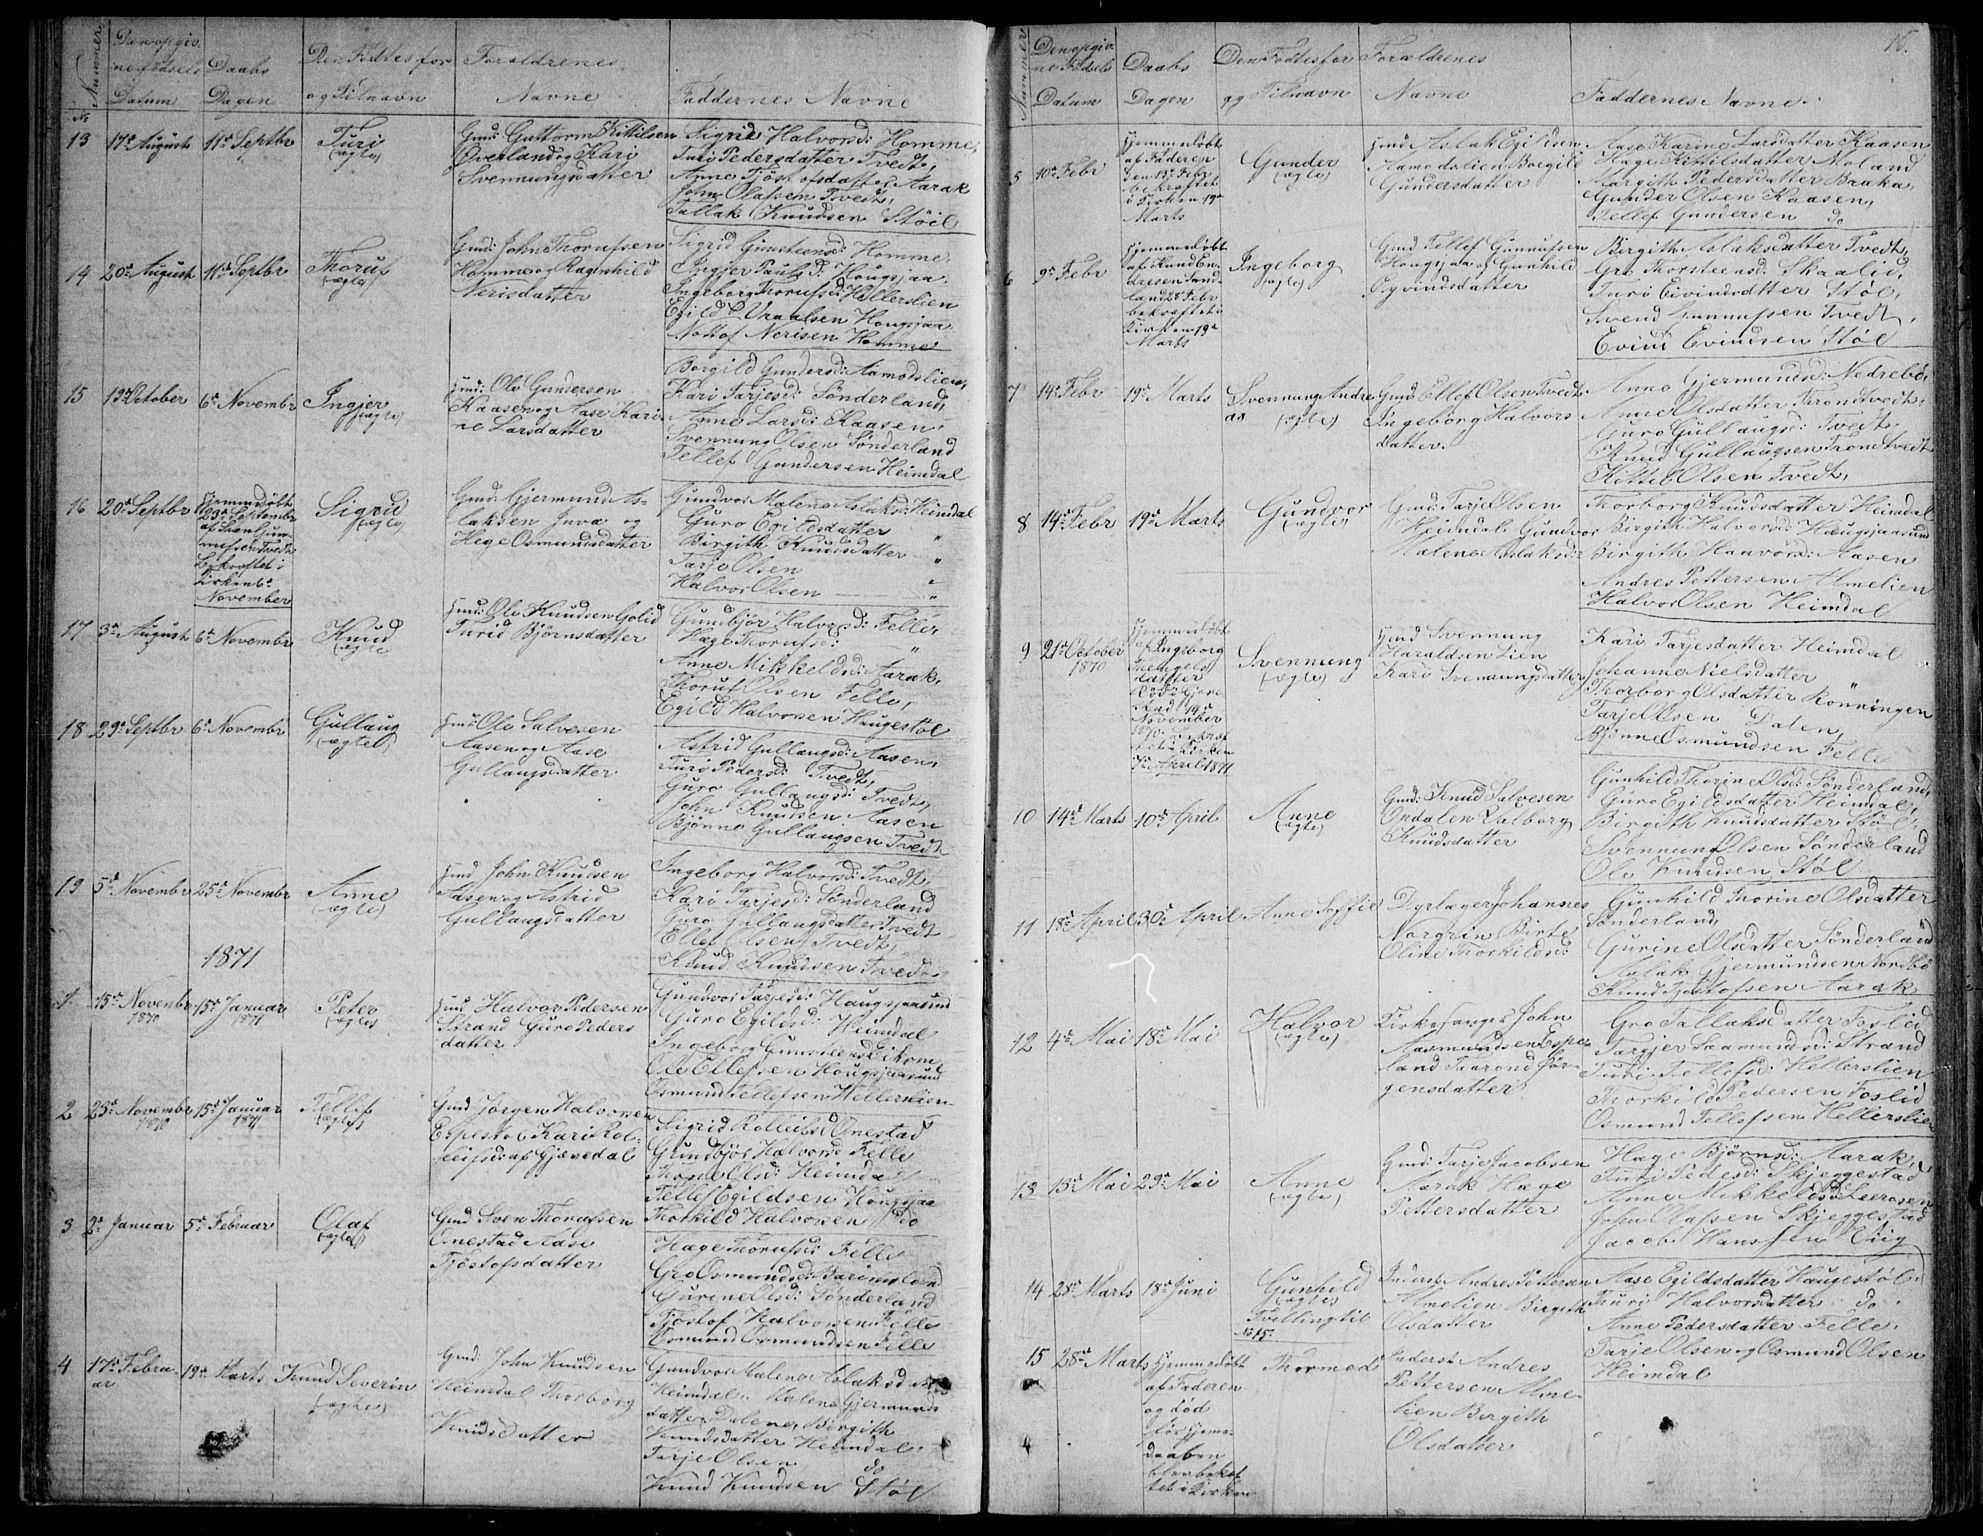 SAKO, Nissedal kirkebøker, G/Gb/L0002: Klokkerbok nr. II 2, 1863-1892, s. 15